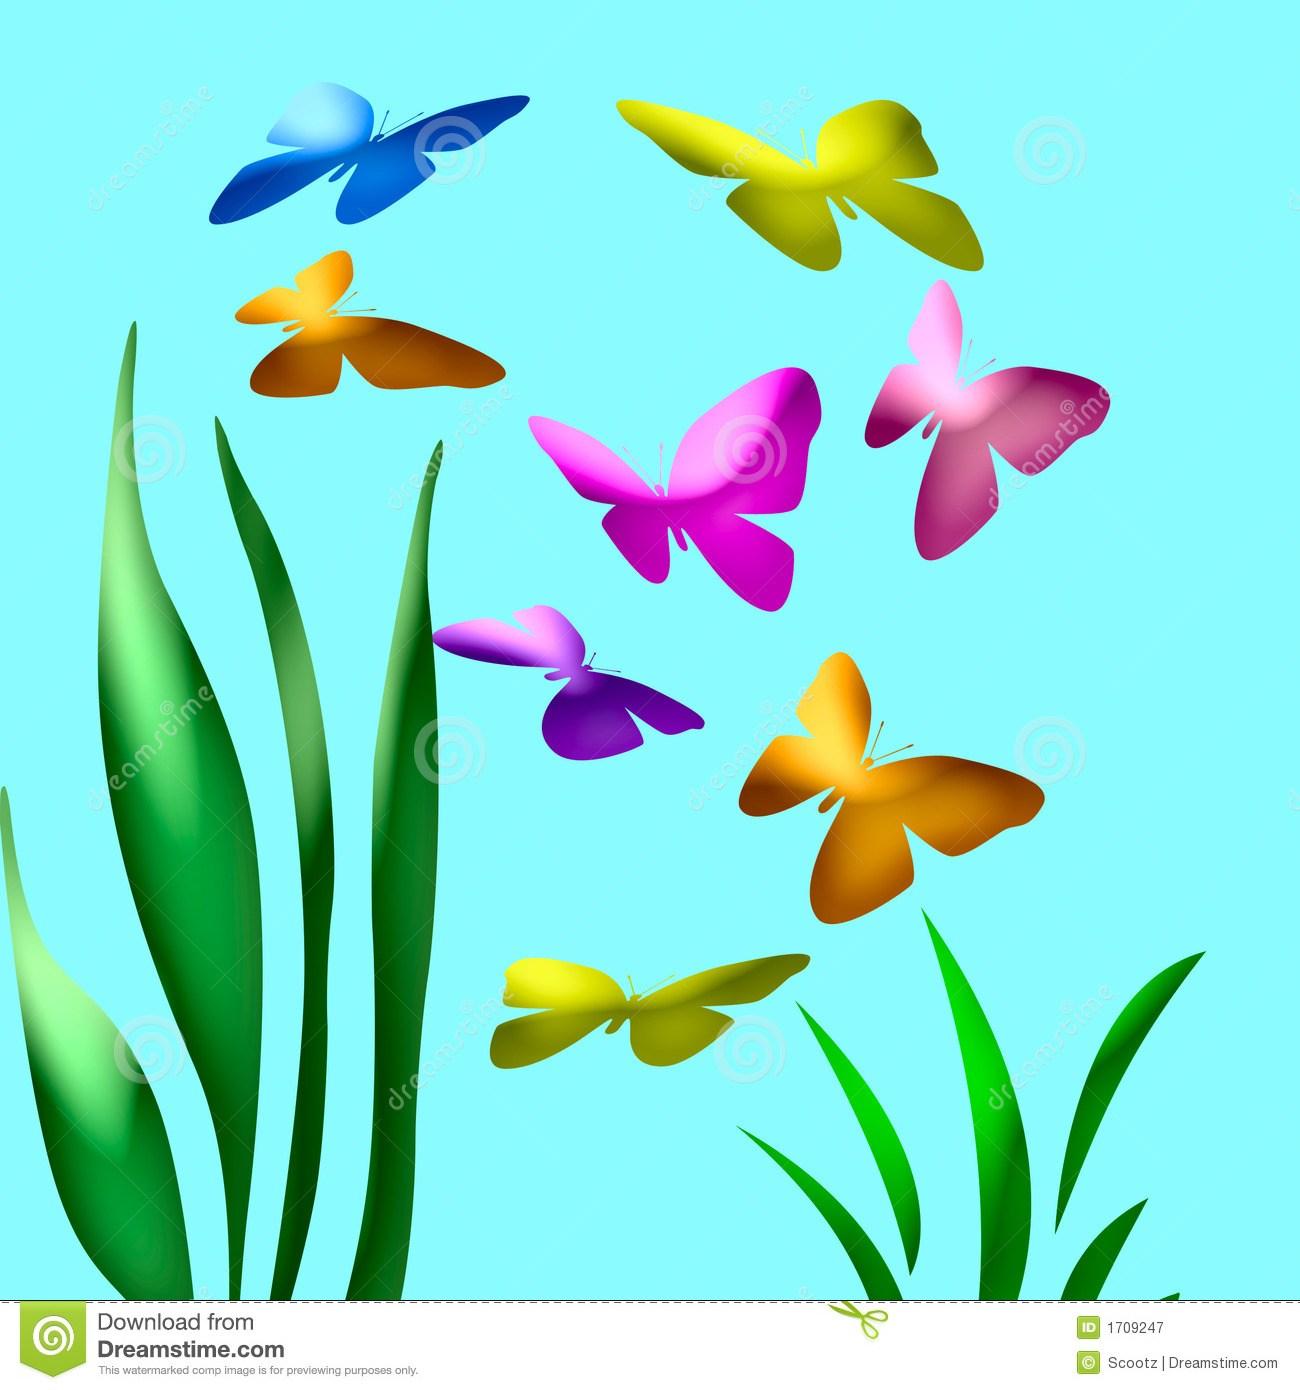 Butterfly in garden clipart 7 » Clipart Portal.